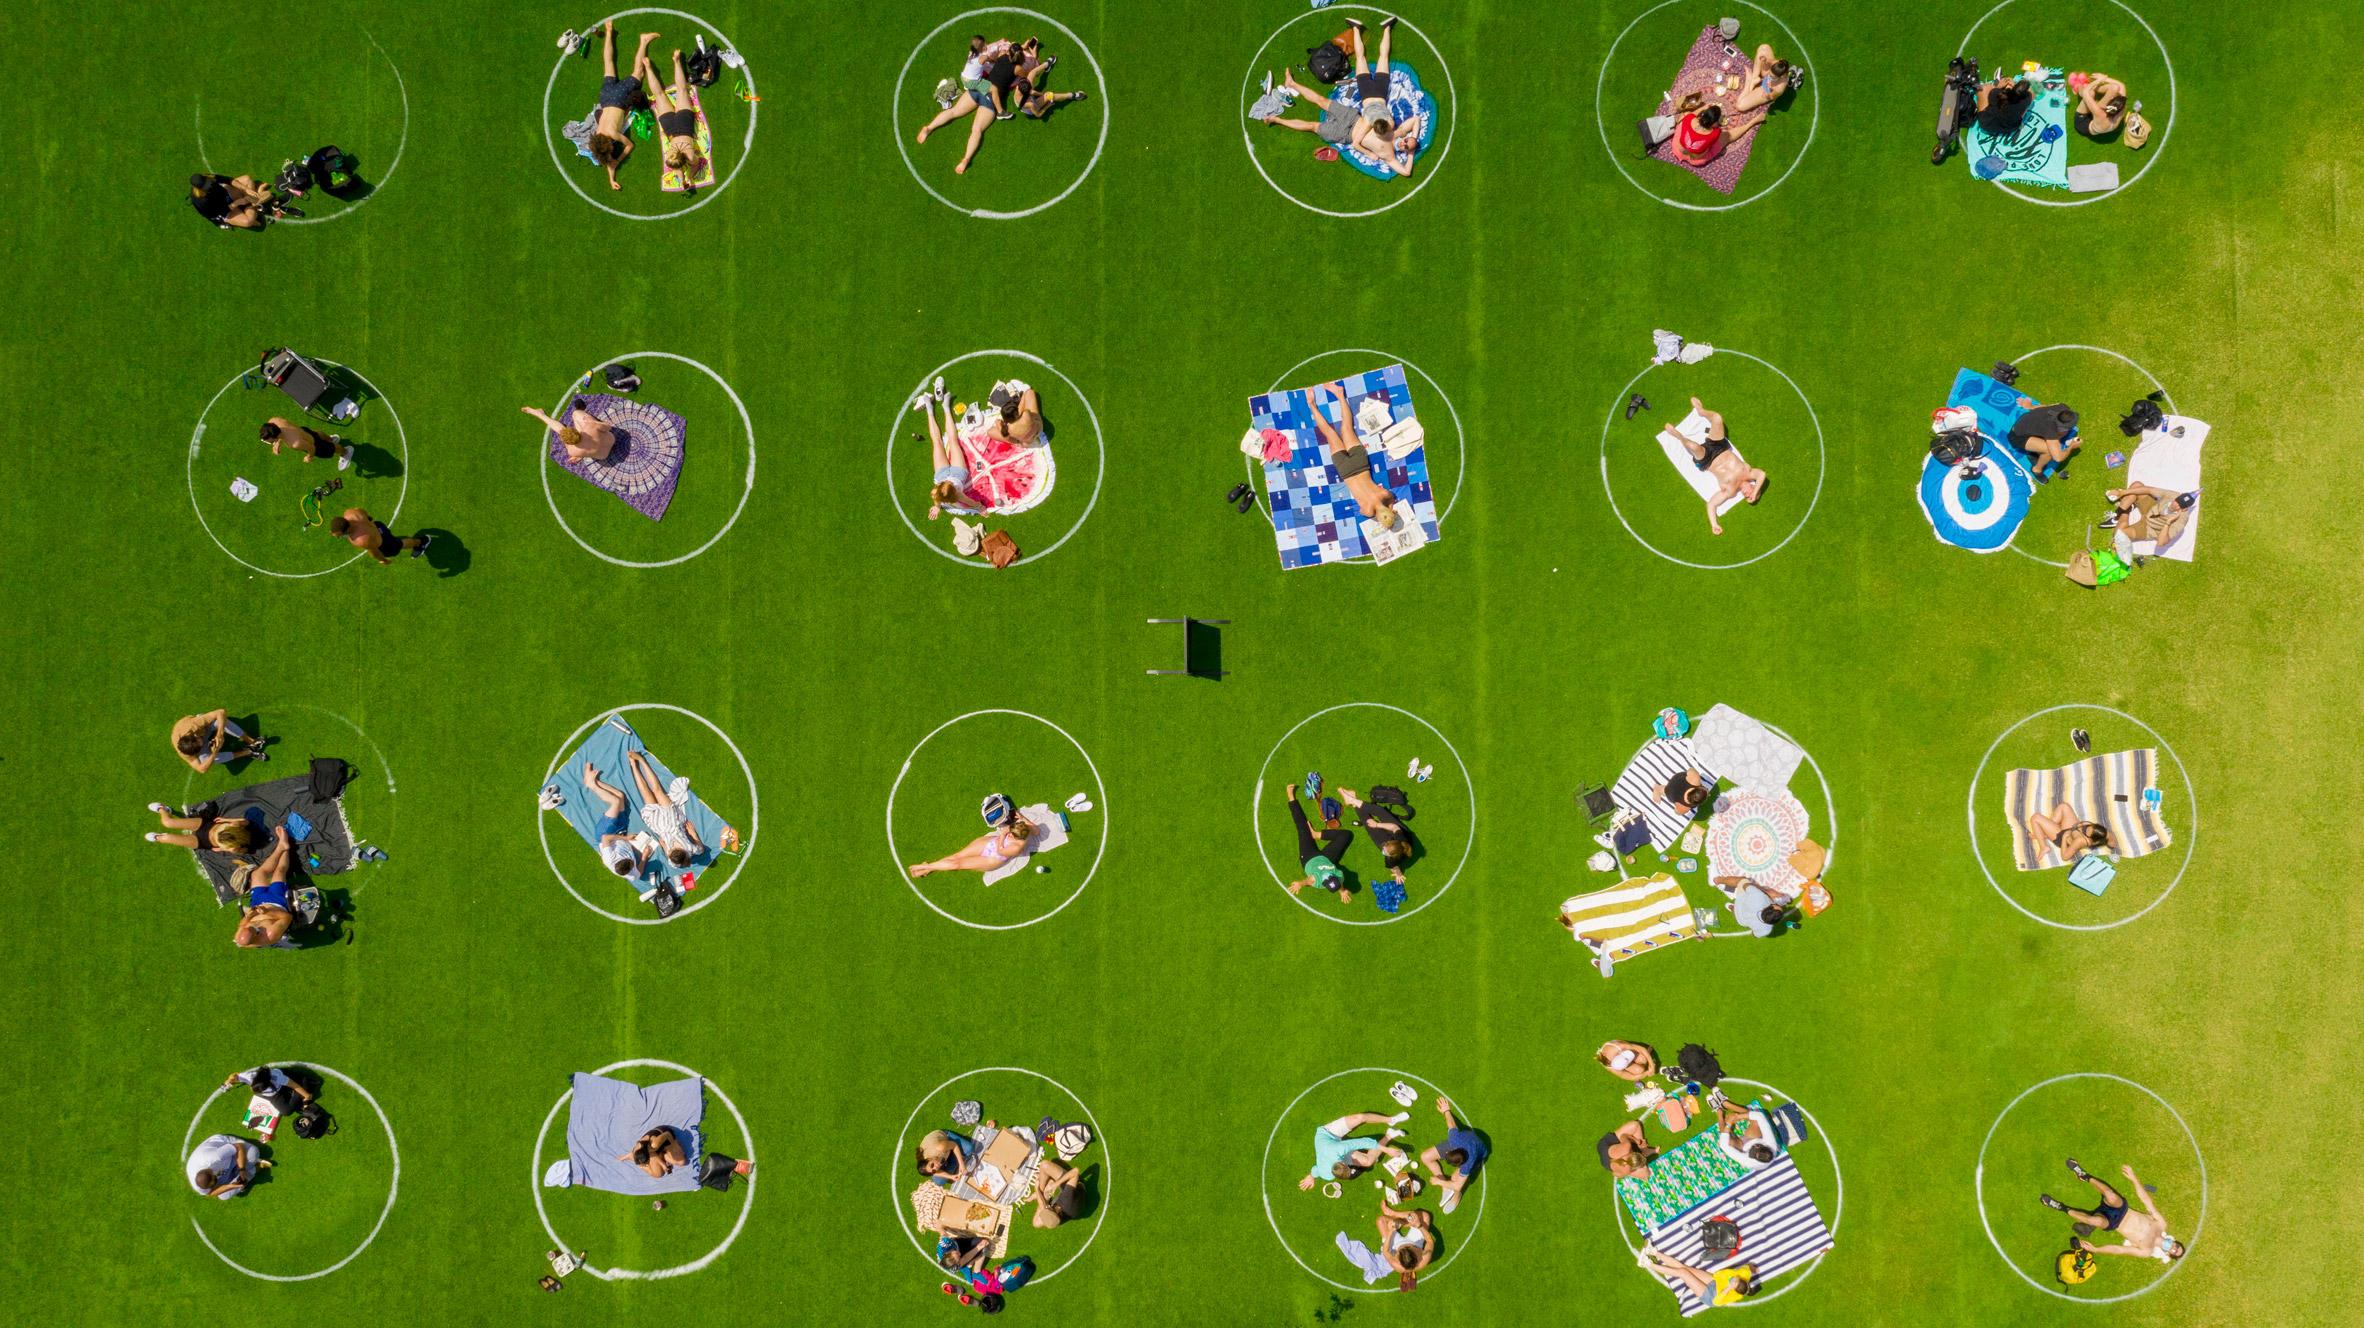 fairly coronadesign cercles distanciation physique domino park